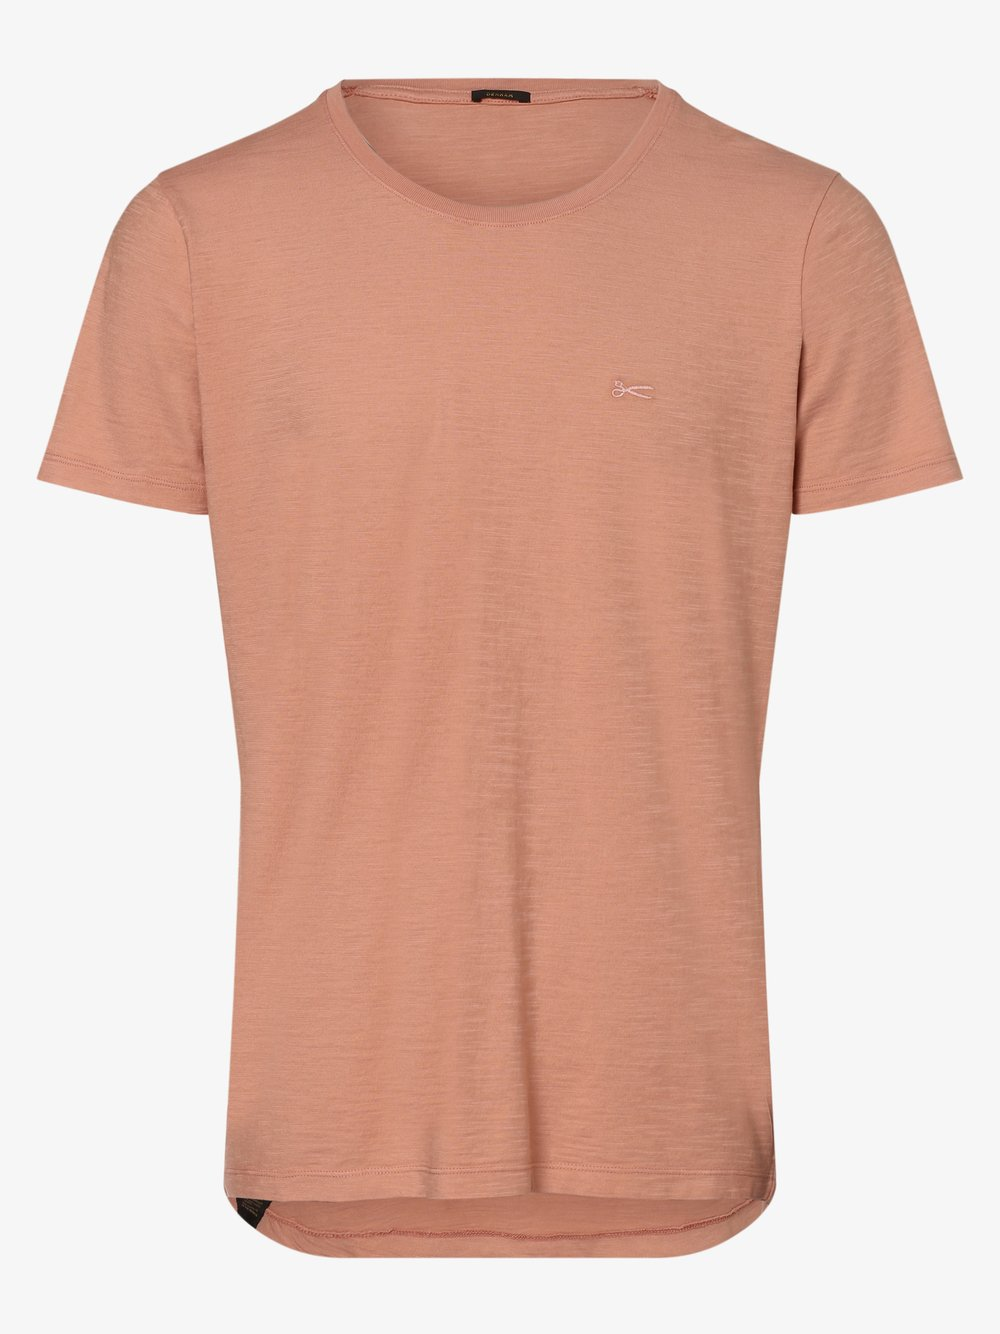 DENHAM – T-shirt męski, różowy Van Graaf 473197-0001-09940